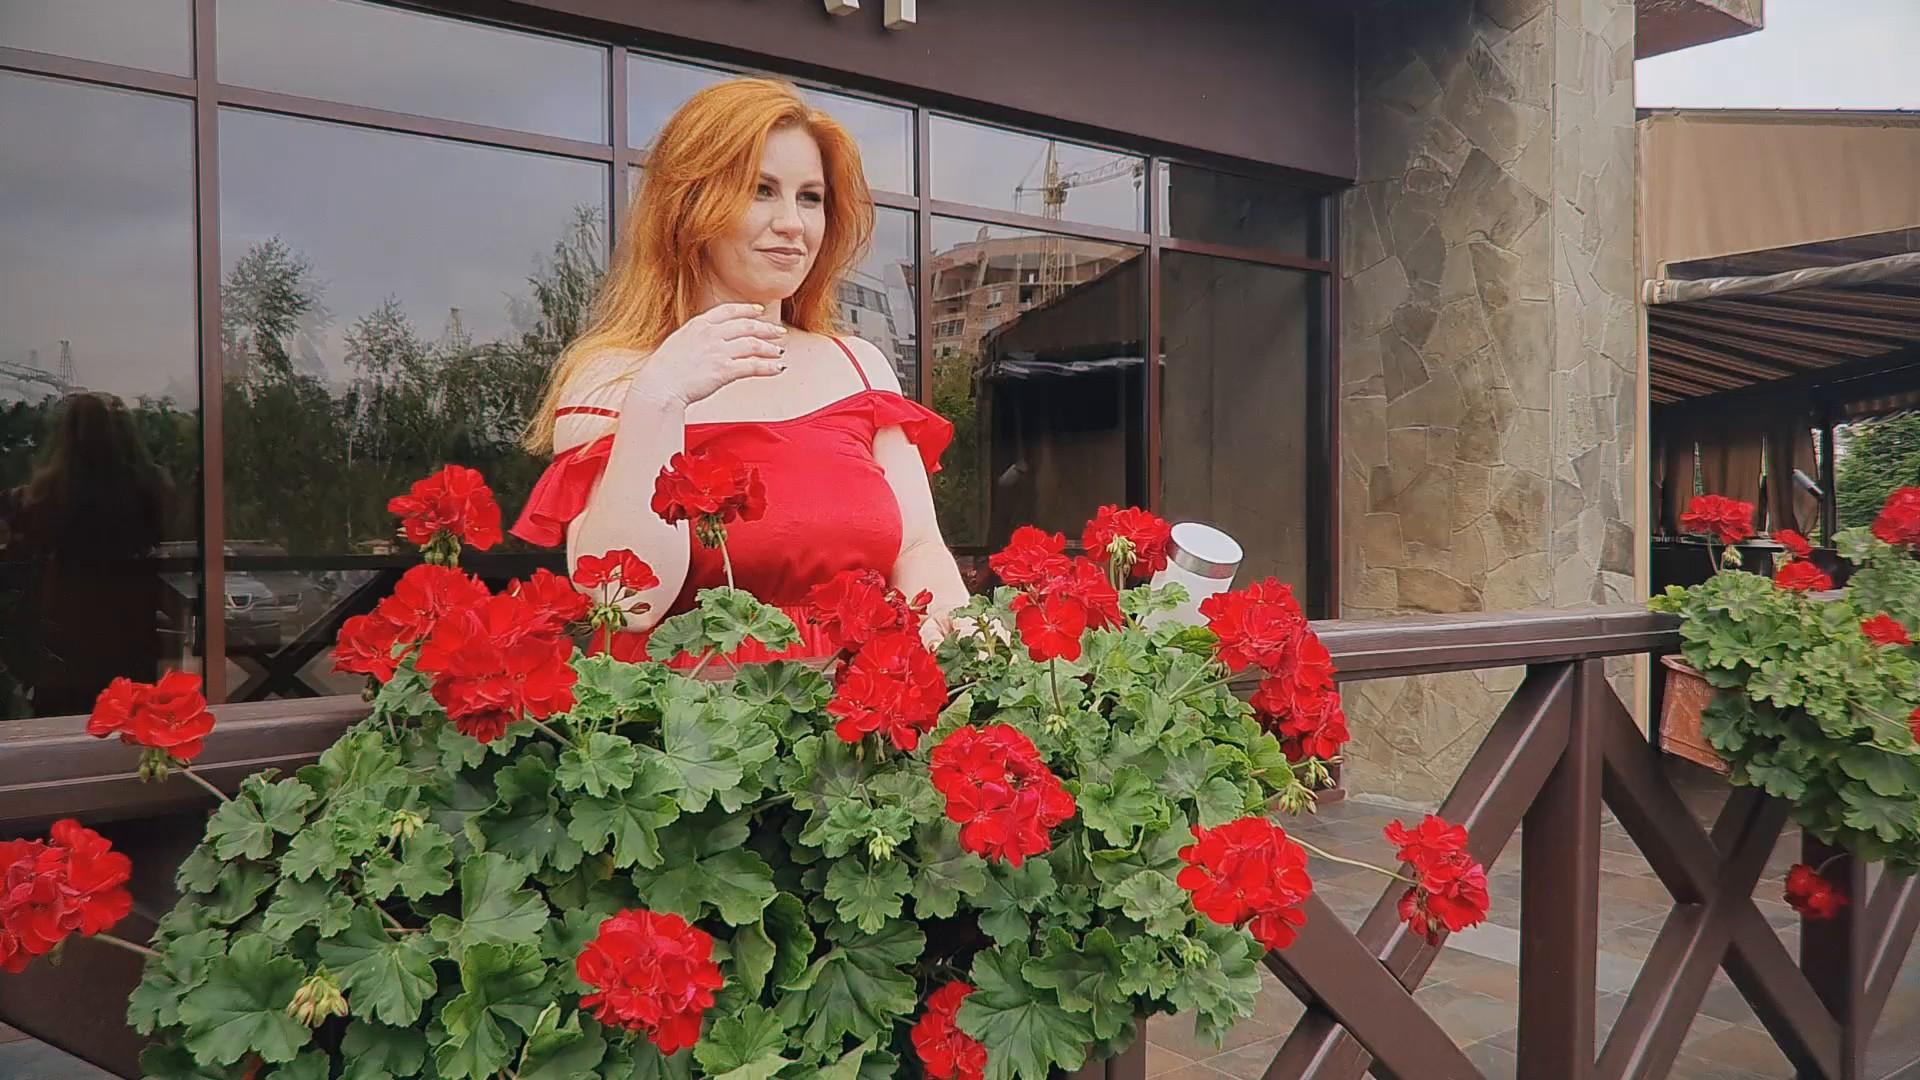 Natalie Ivano-Frankovsk 33 y.o. - intelligent lady - small public photo.